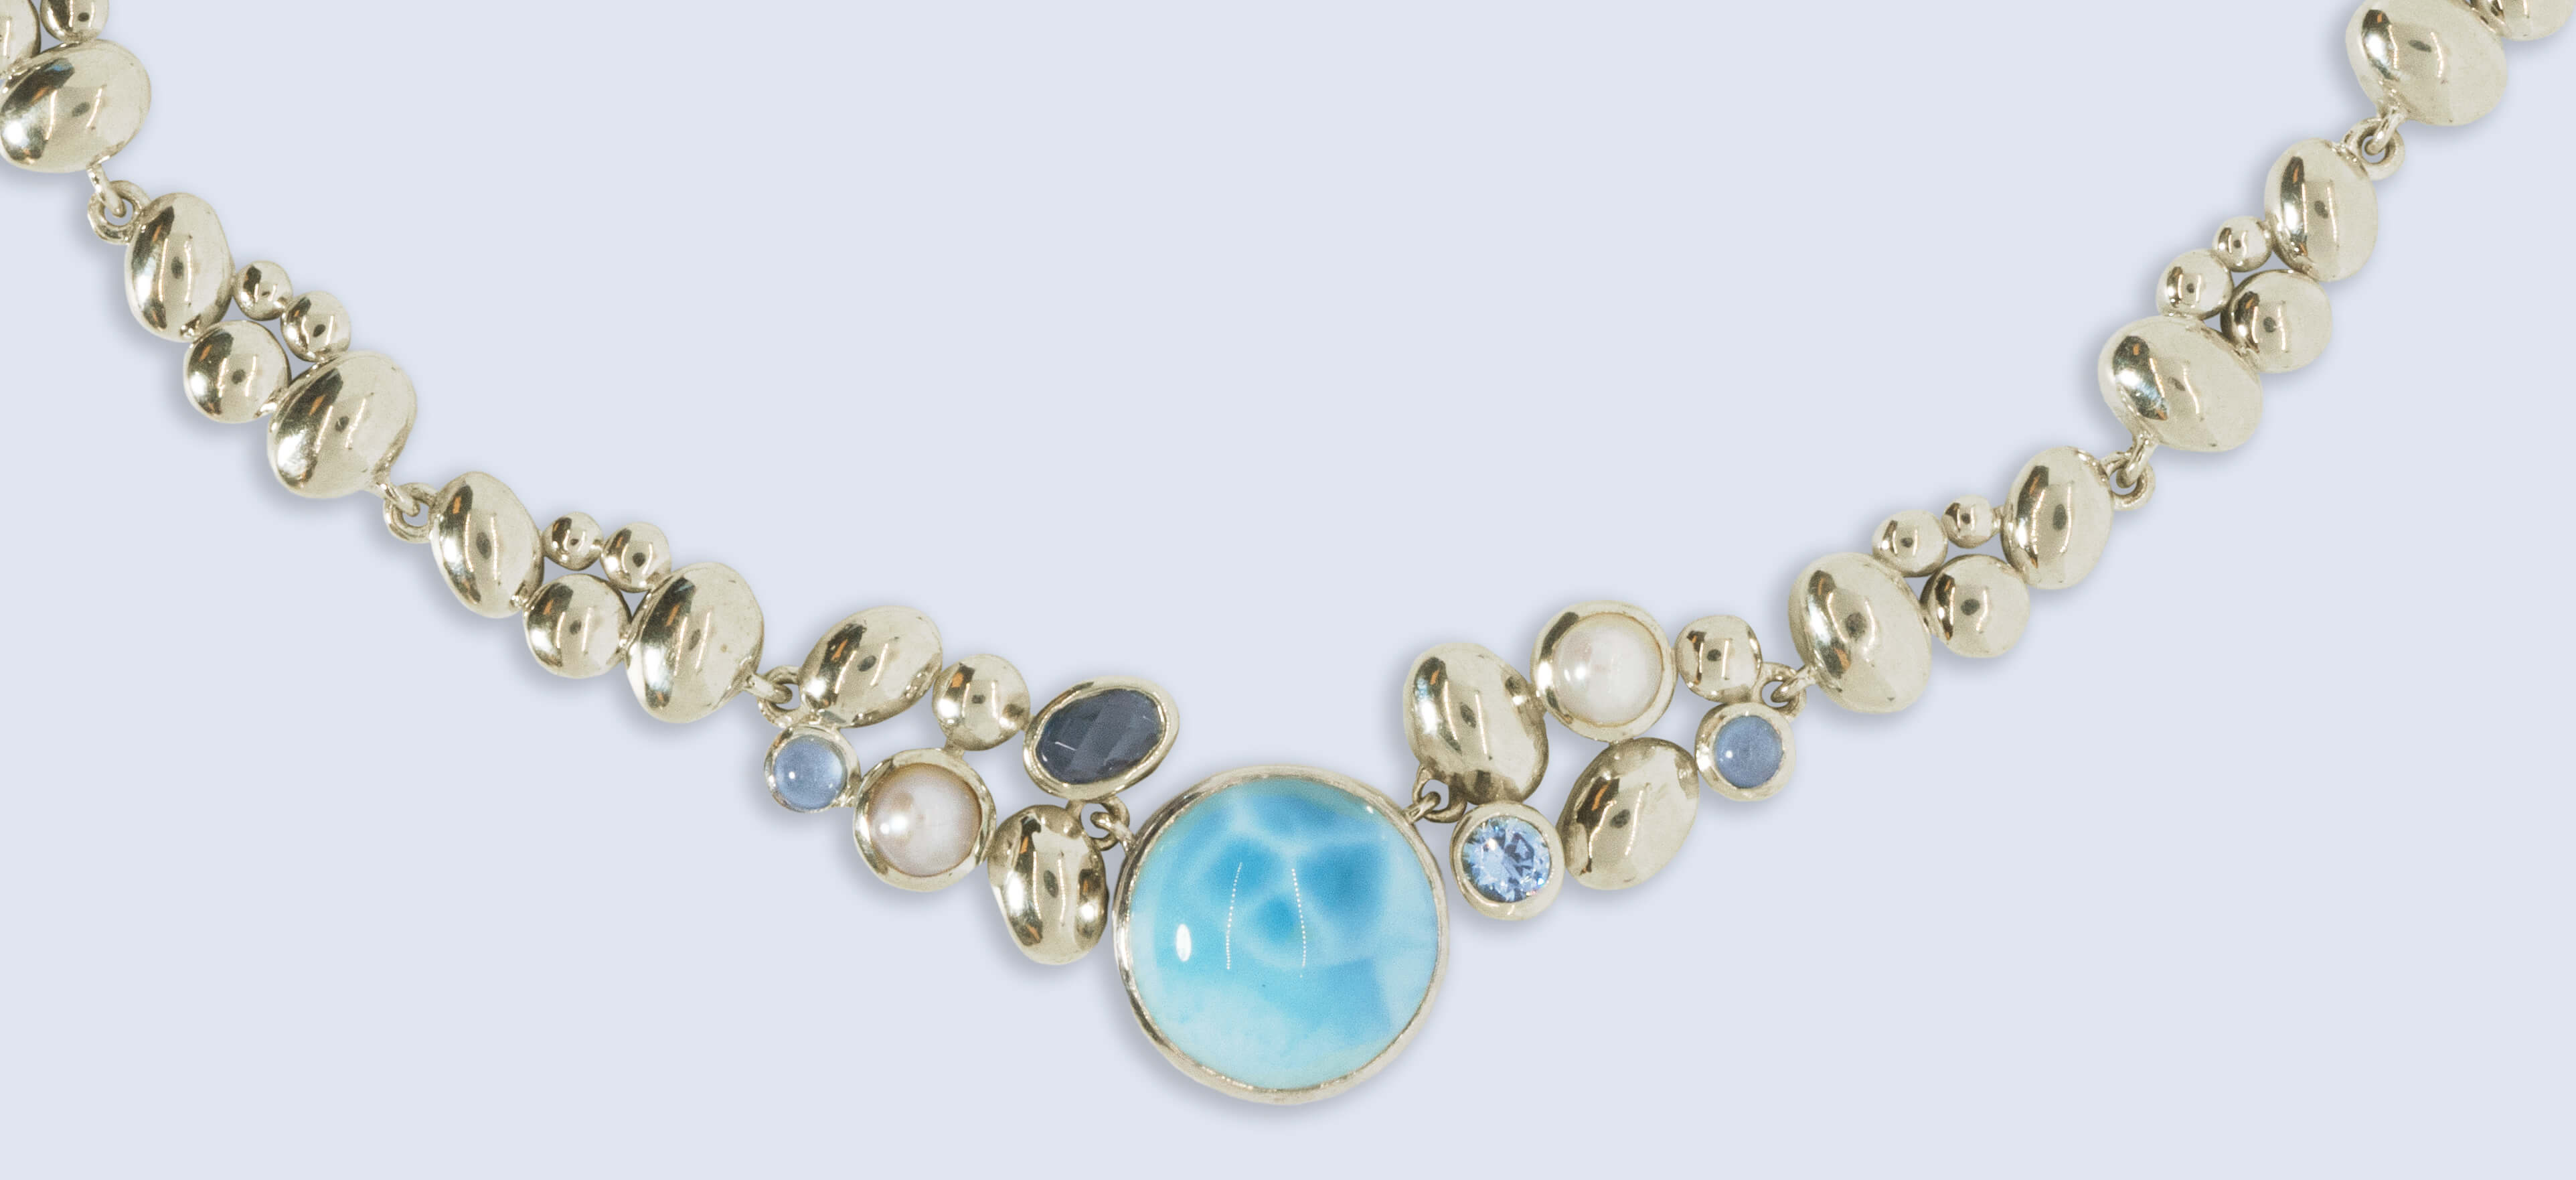 Tarnished sterling silver larimar gemstone jewelry